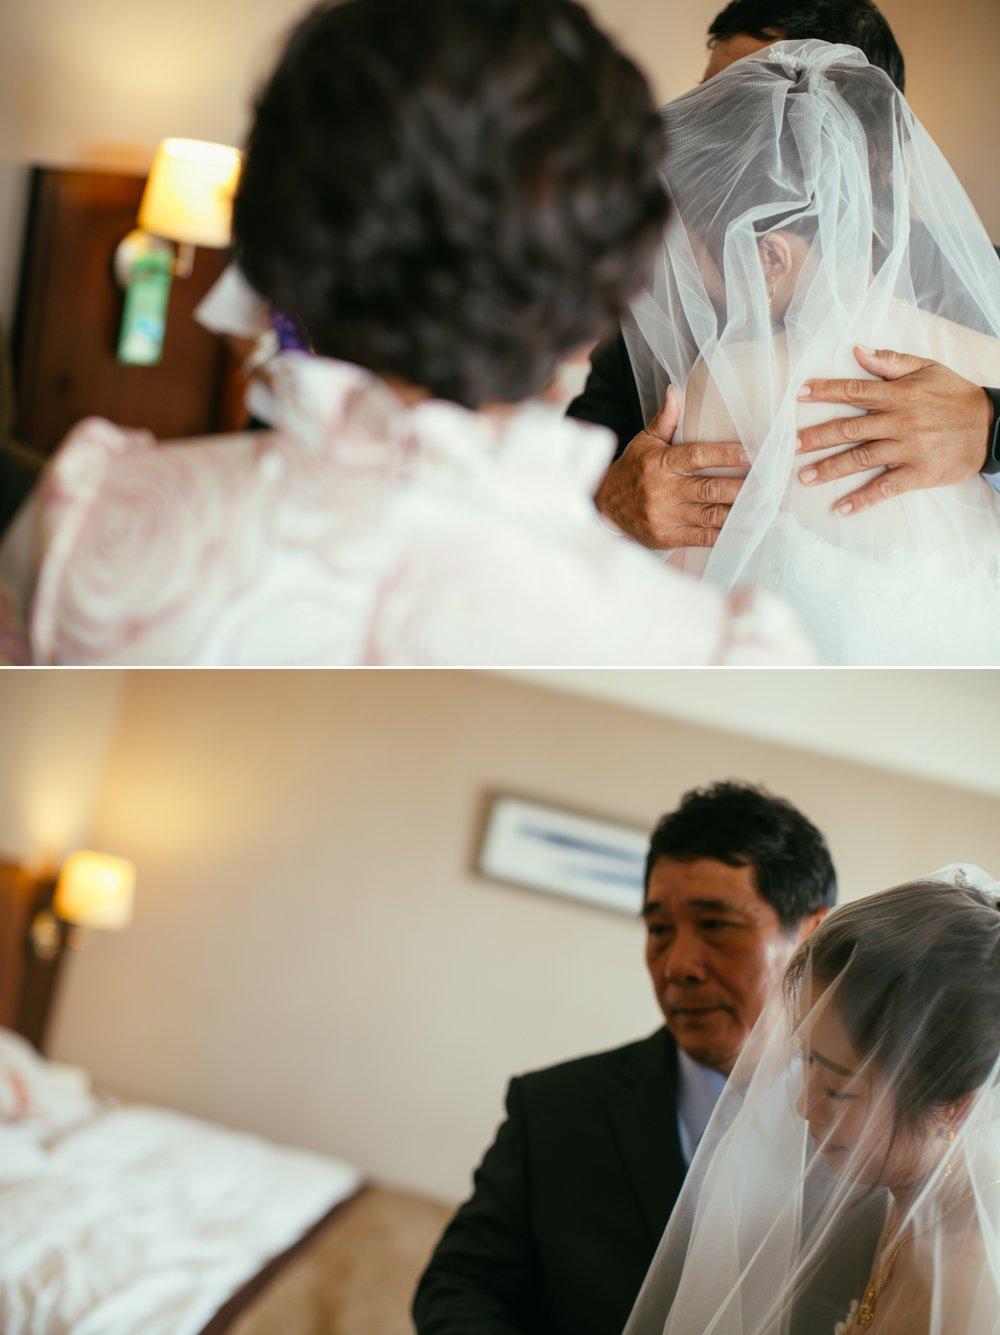 Tina+Nash-wedding-台北婚禮迎娶晚宴-新莊終身大事-068.jpg